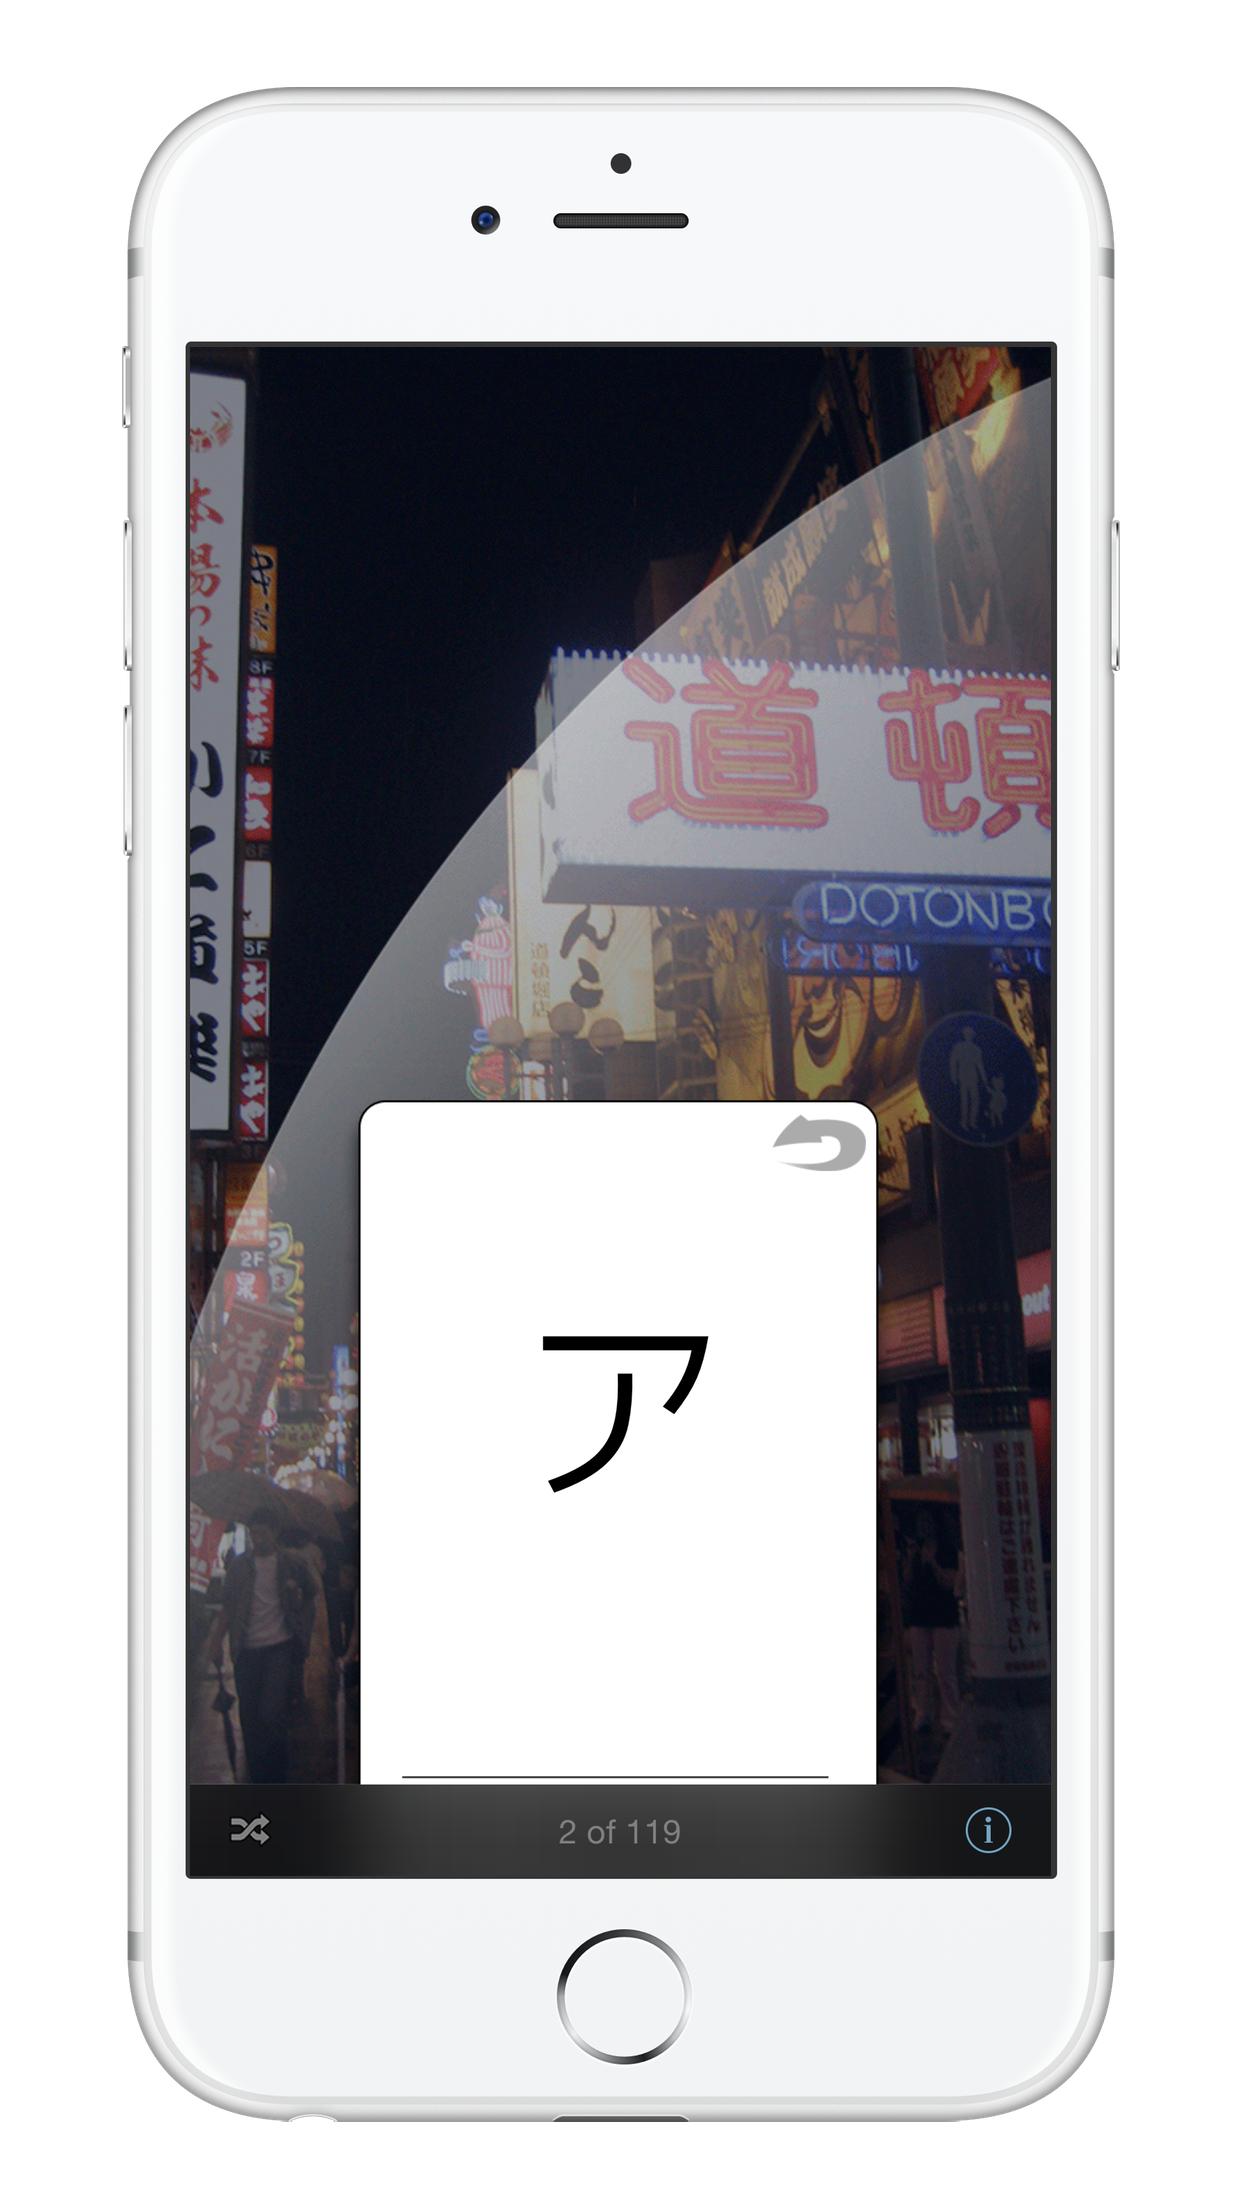 Katakana screenshot 1.png